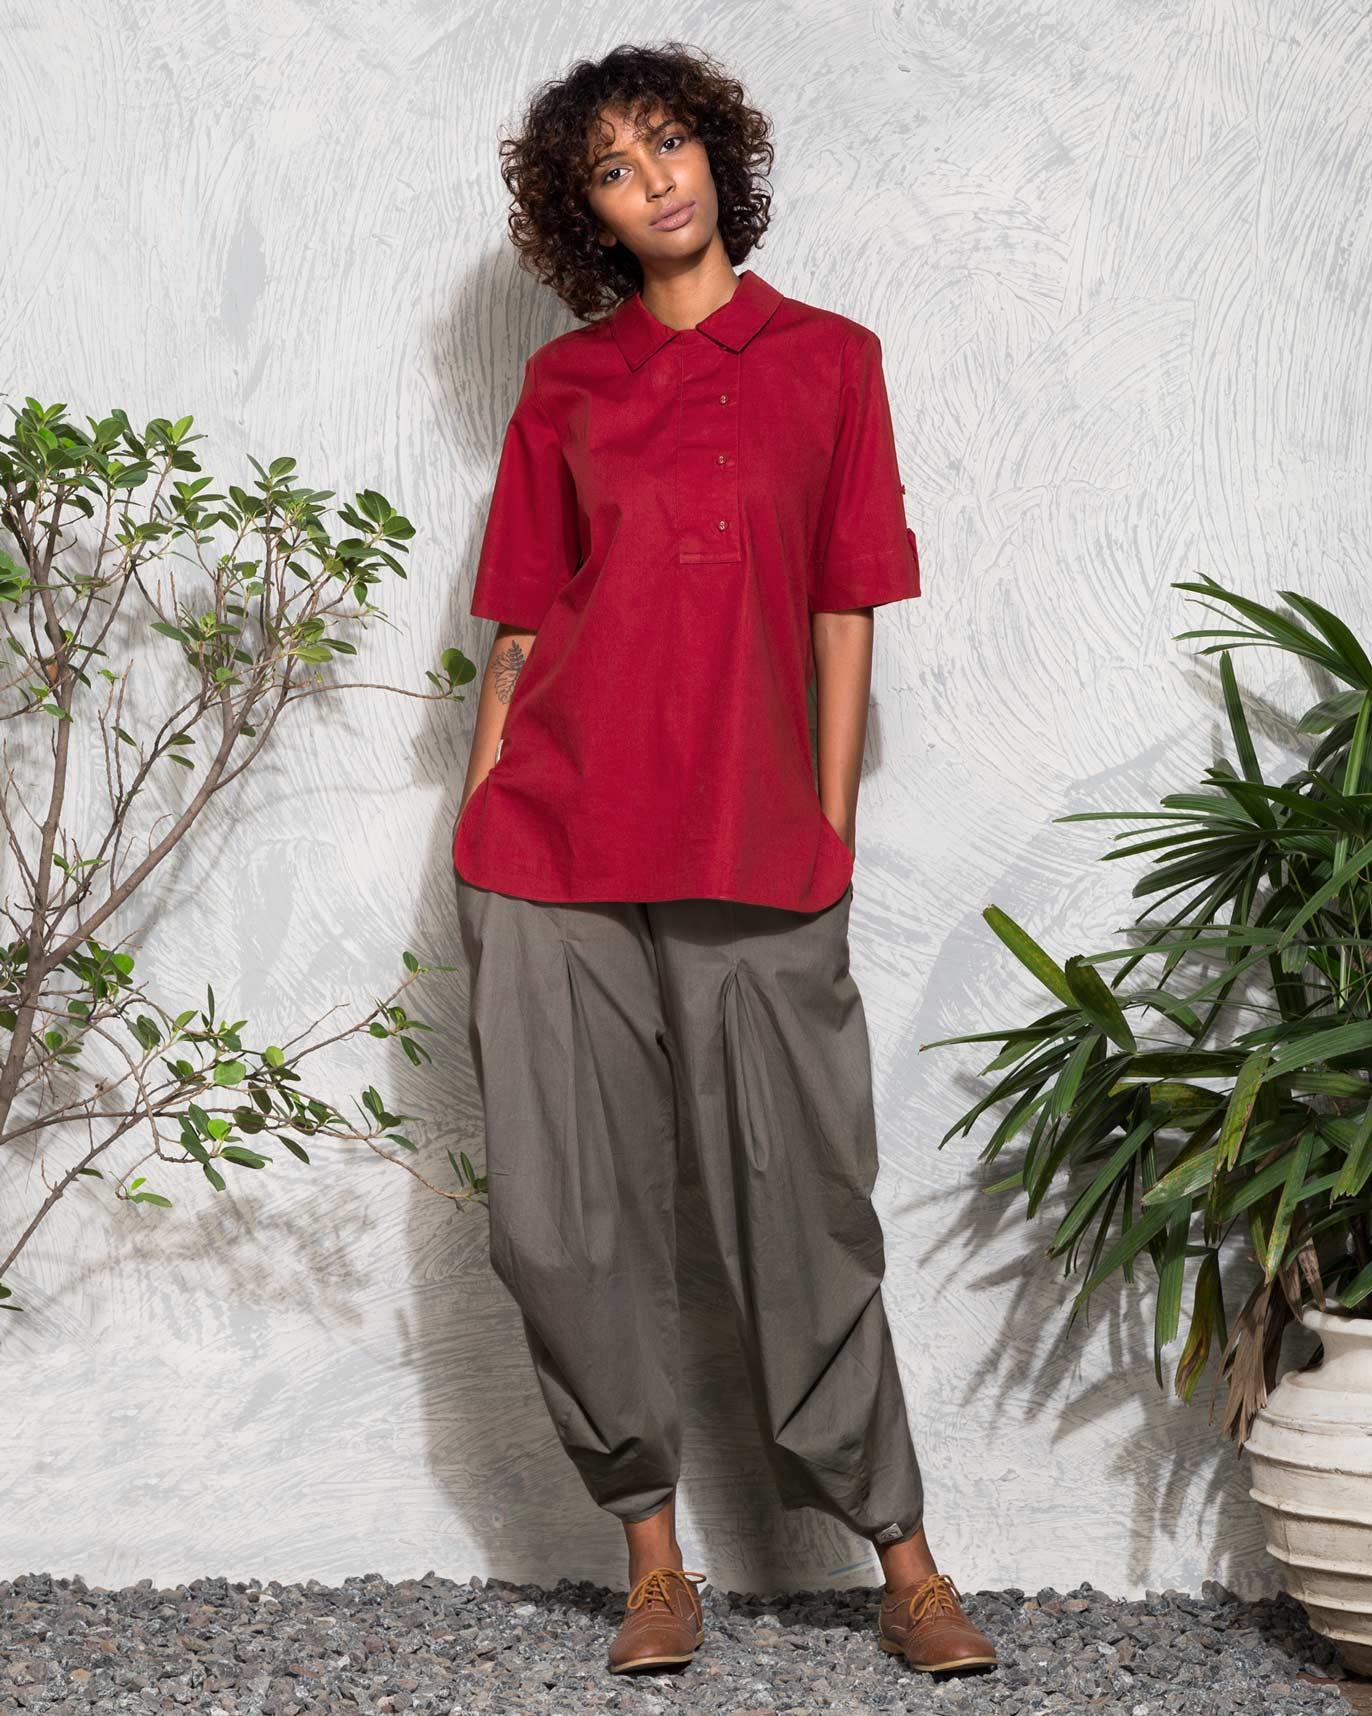 86eab02c5155 Buy Coast Dresses Online